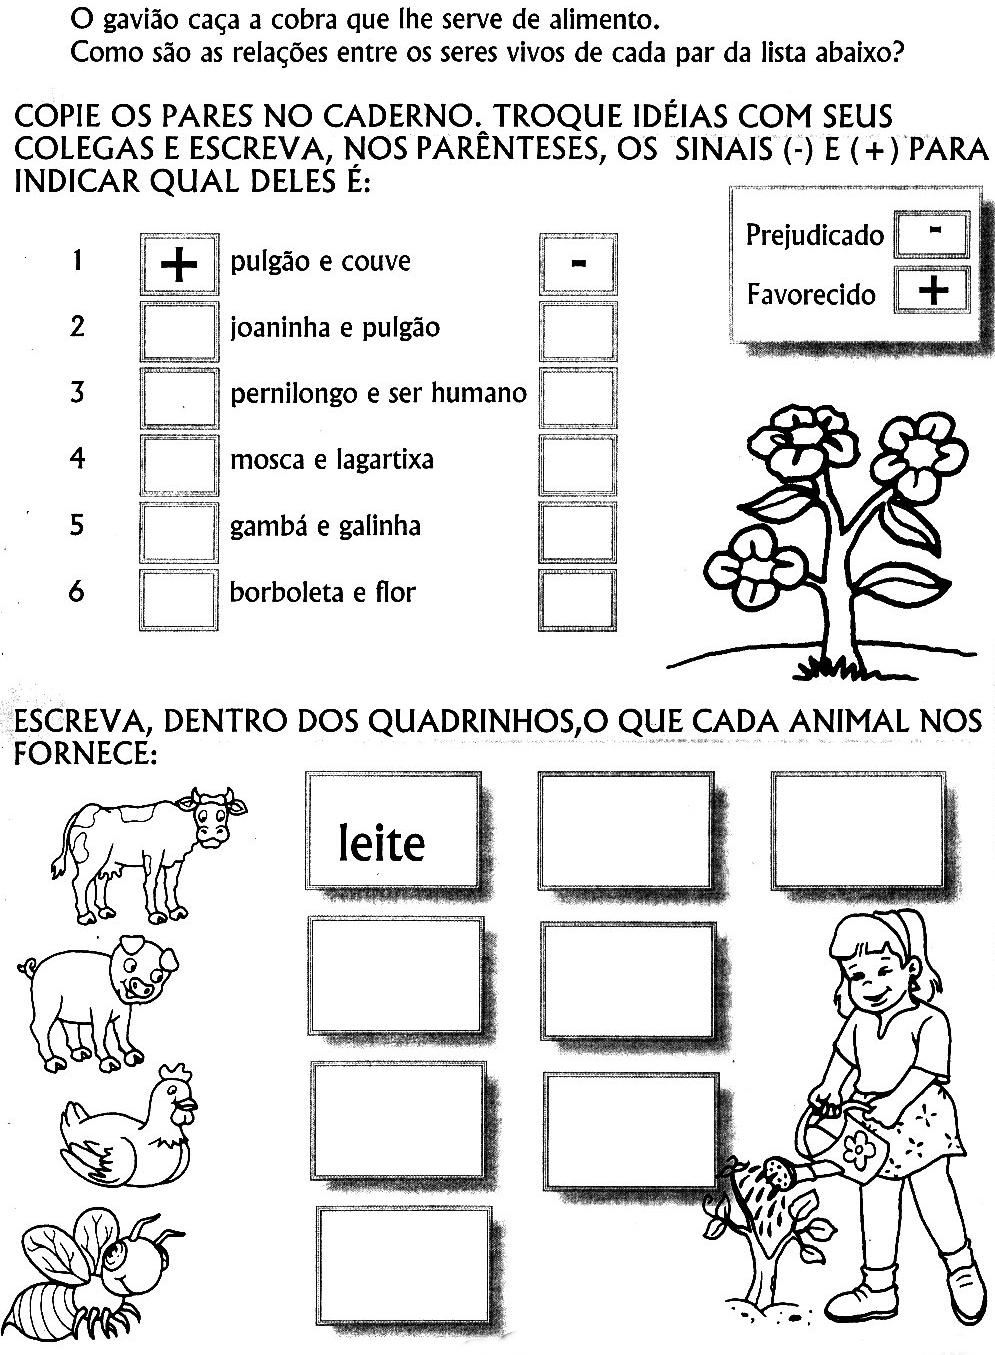 95 ATIVIDADES EDUCA    O INFANTIL MEIO AMBIENTE ECOLOGIA SERES VIVOS